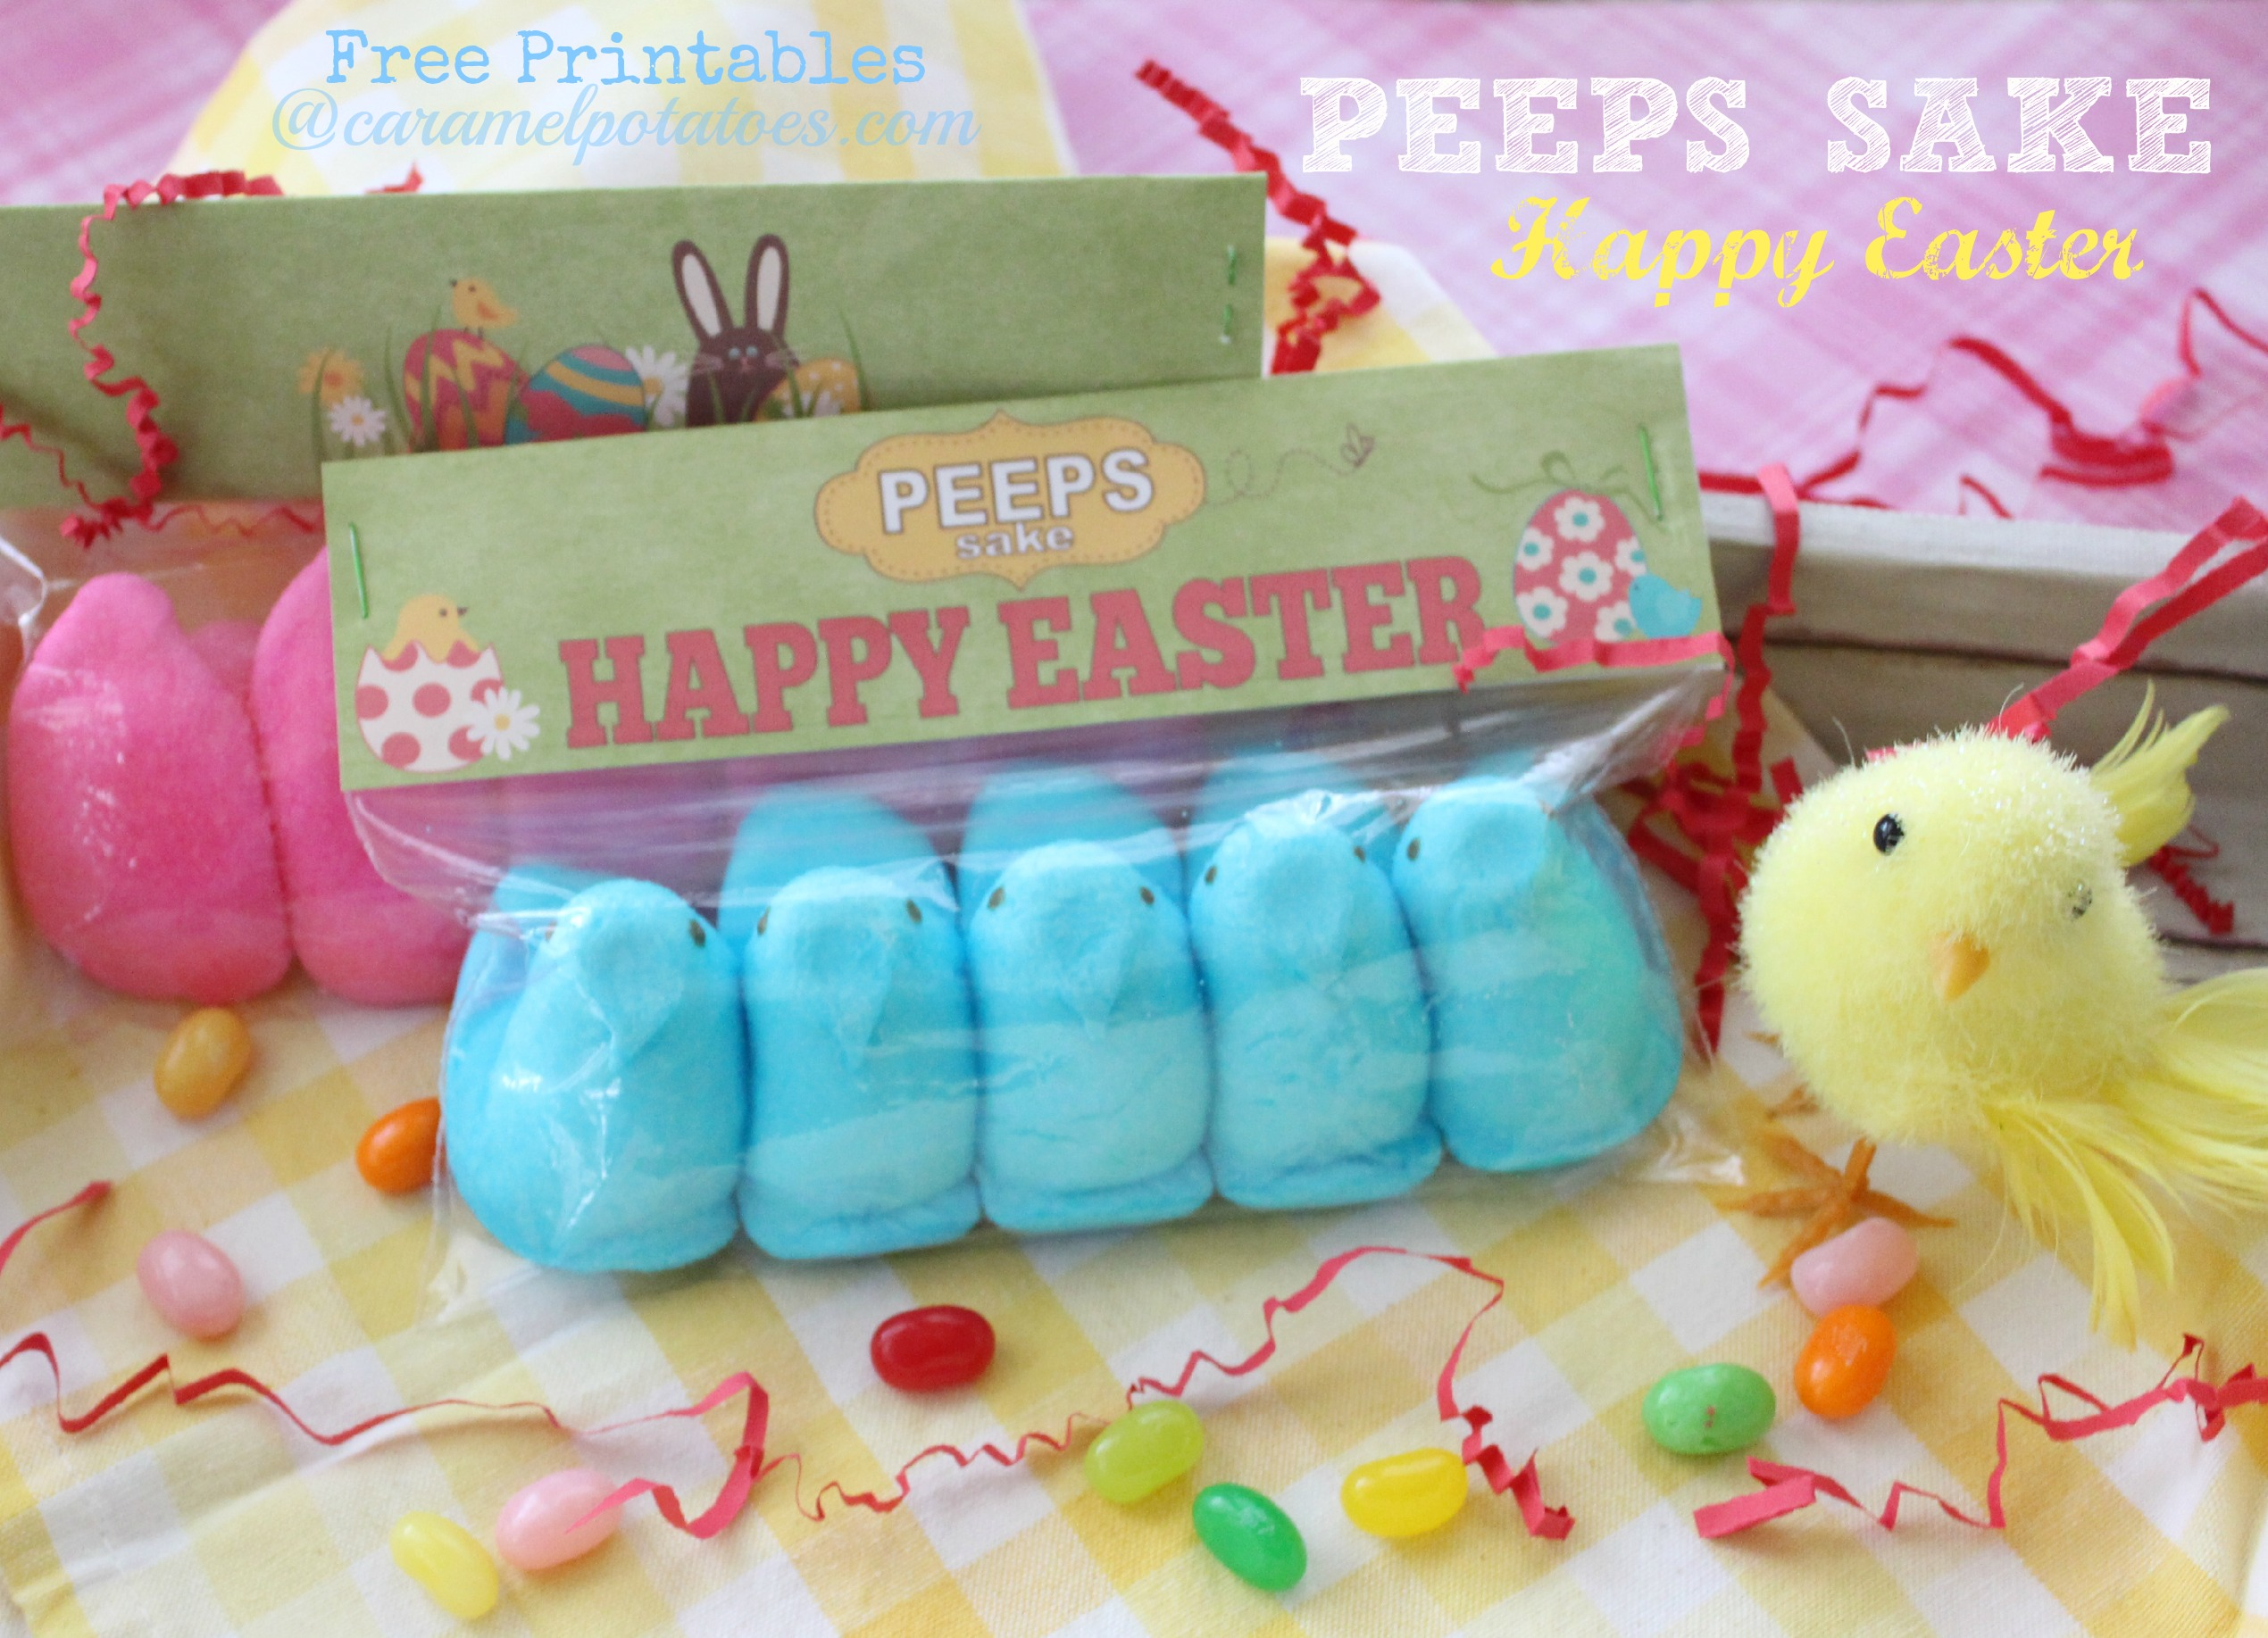 Peeps Sake Happy Easter free printable gift bag topper